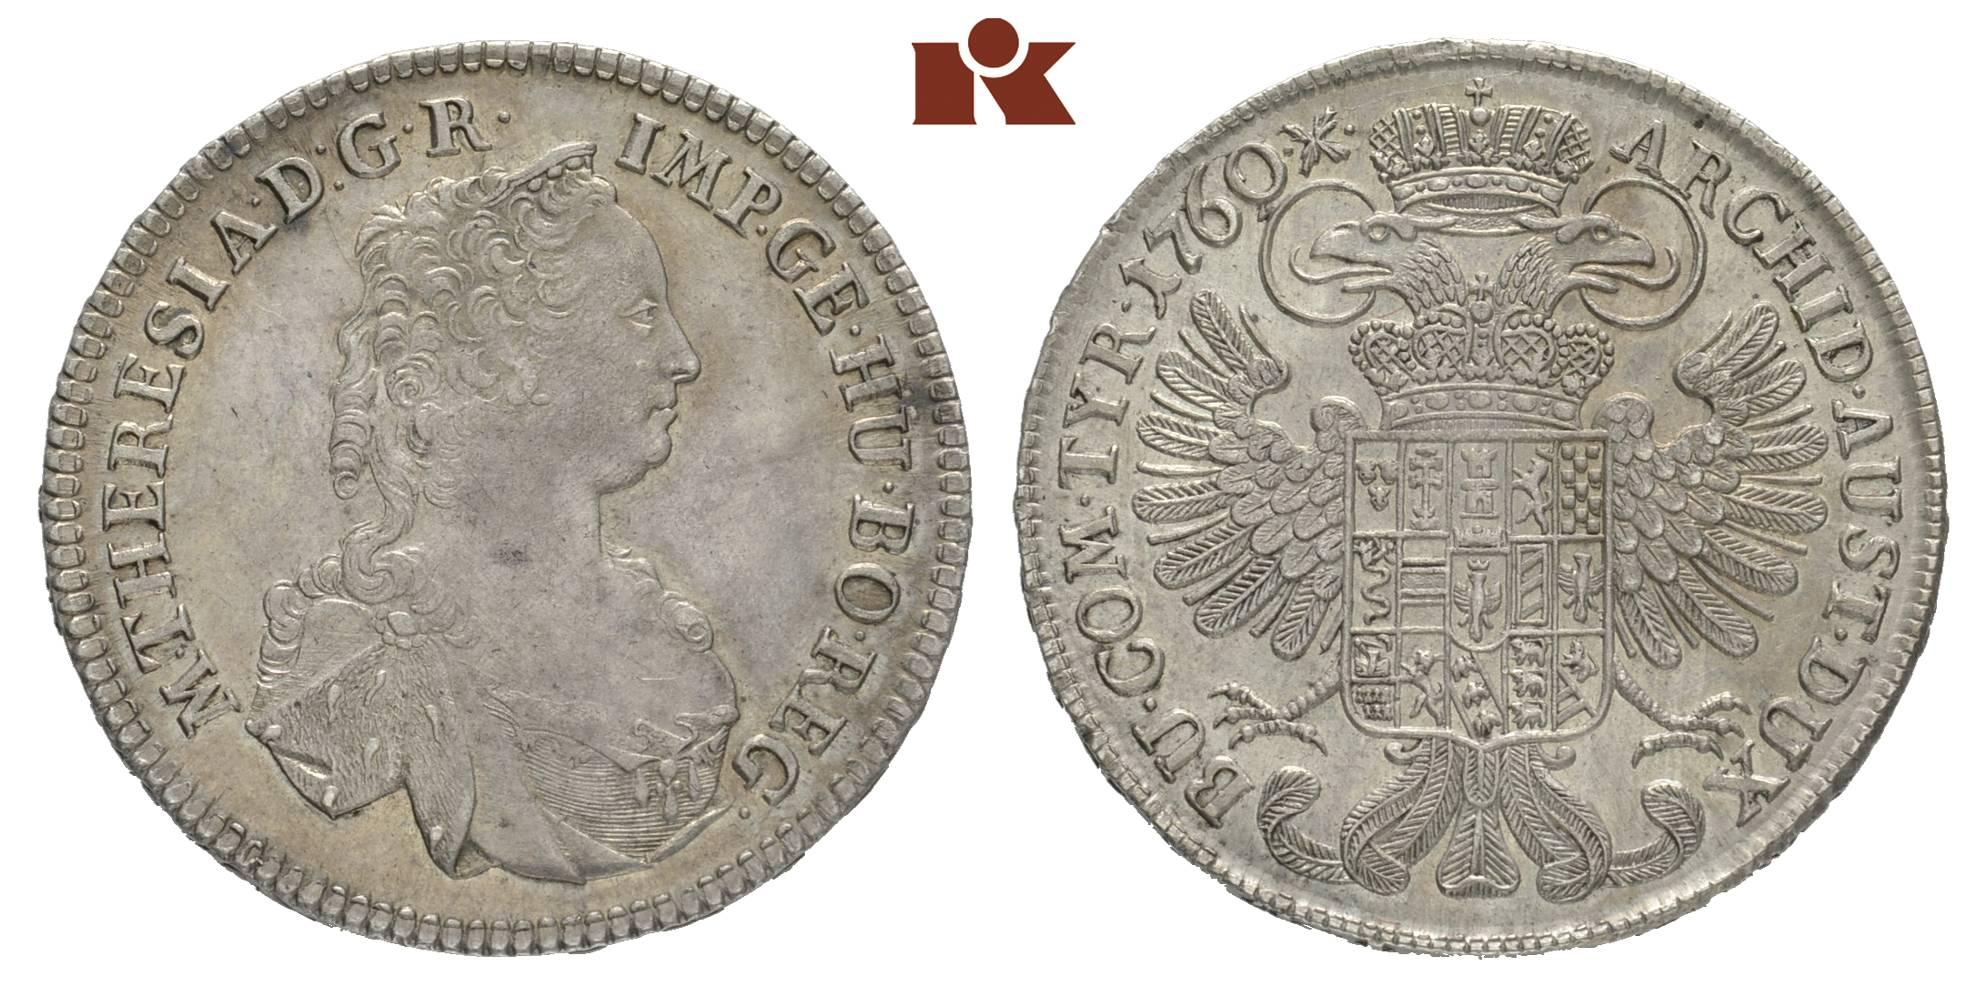 Maria Theresia 1740 1780 12 Reichstaler 1760 Hall Eypeltauer 88